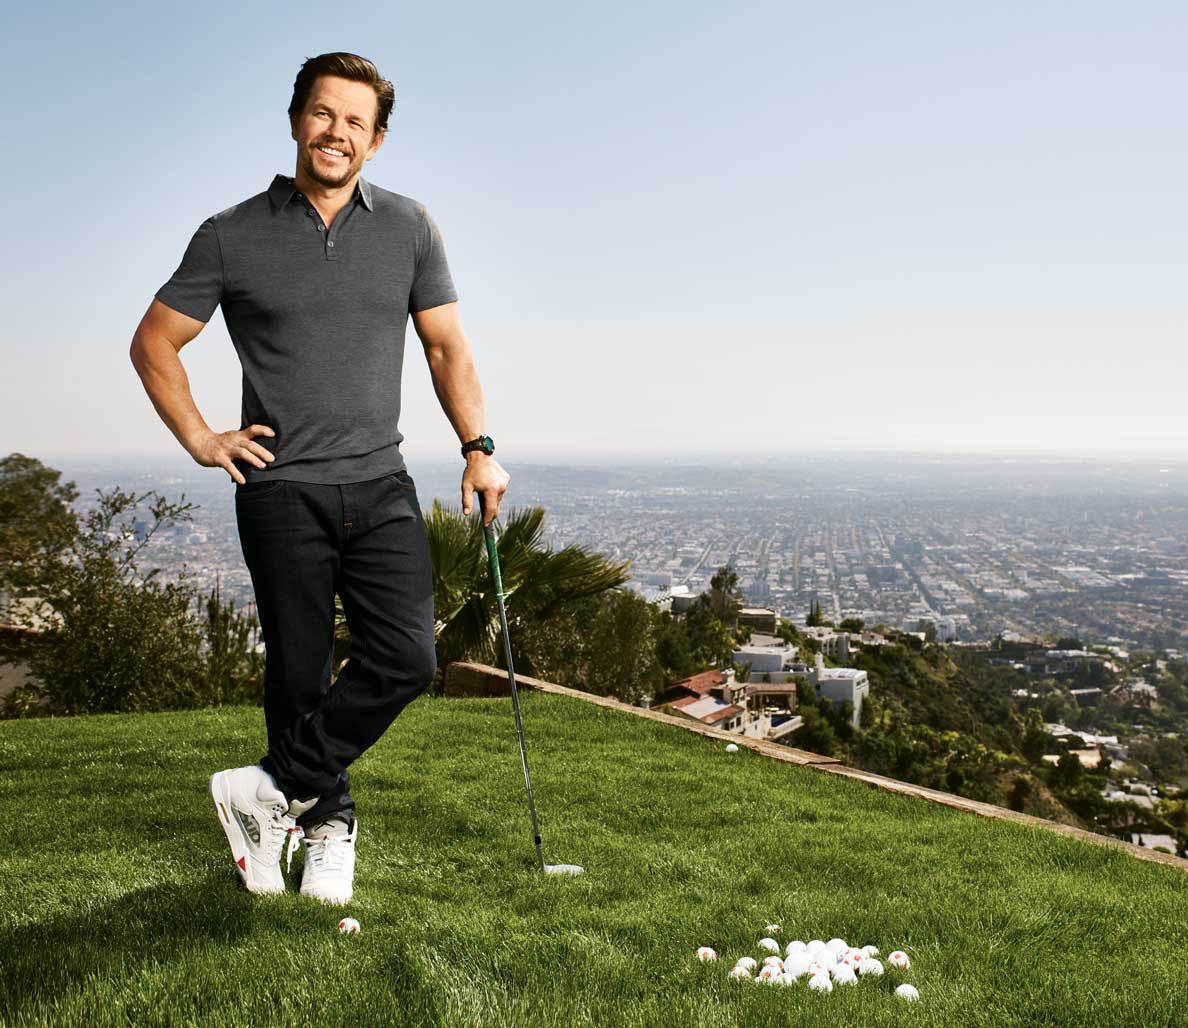 Mark Wahlberg - Men's Fitness Photoshoot - 2016